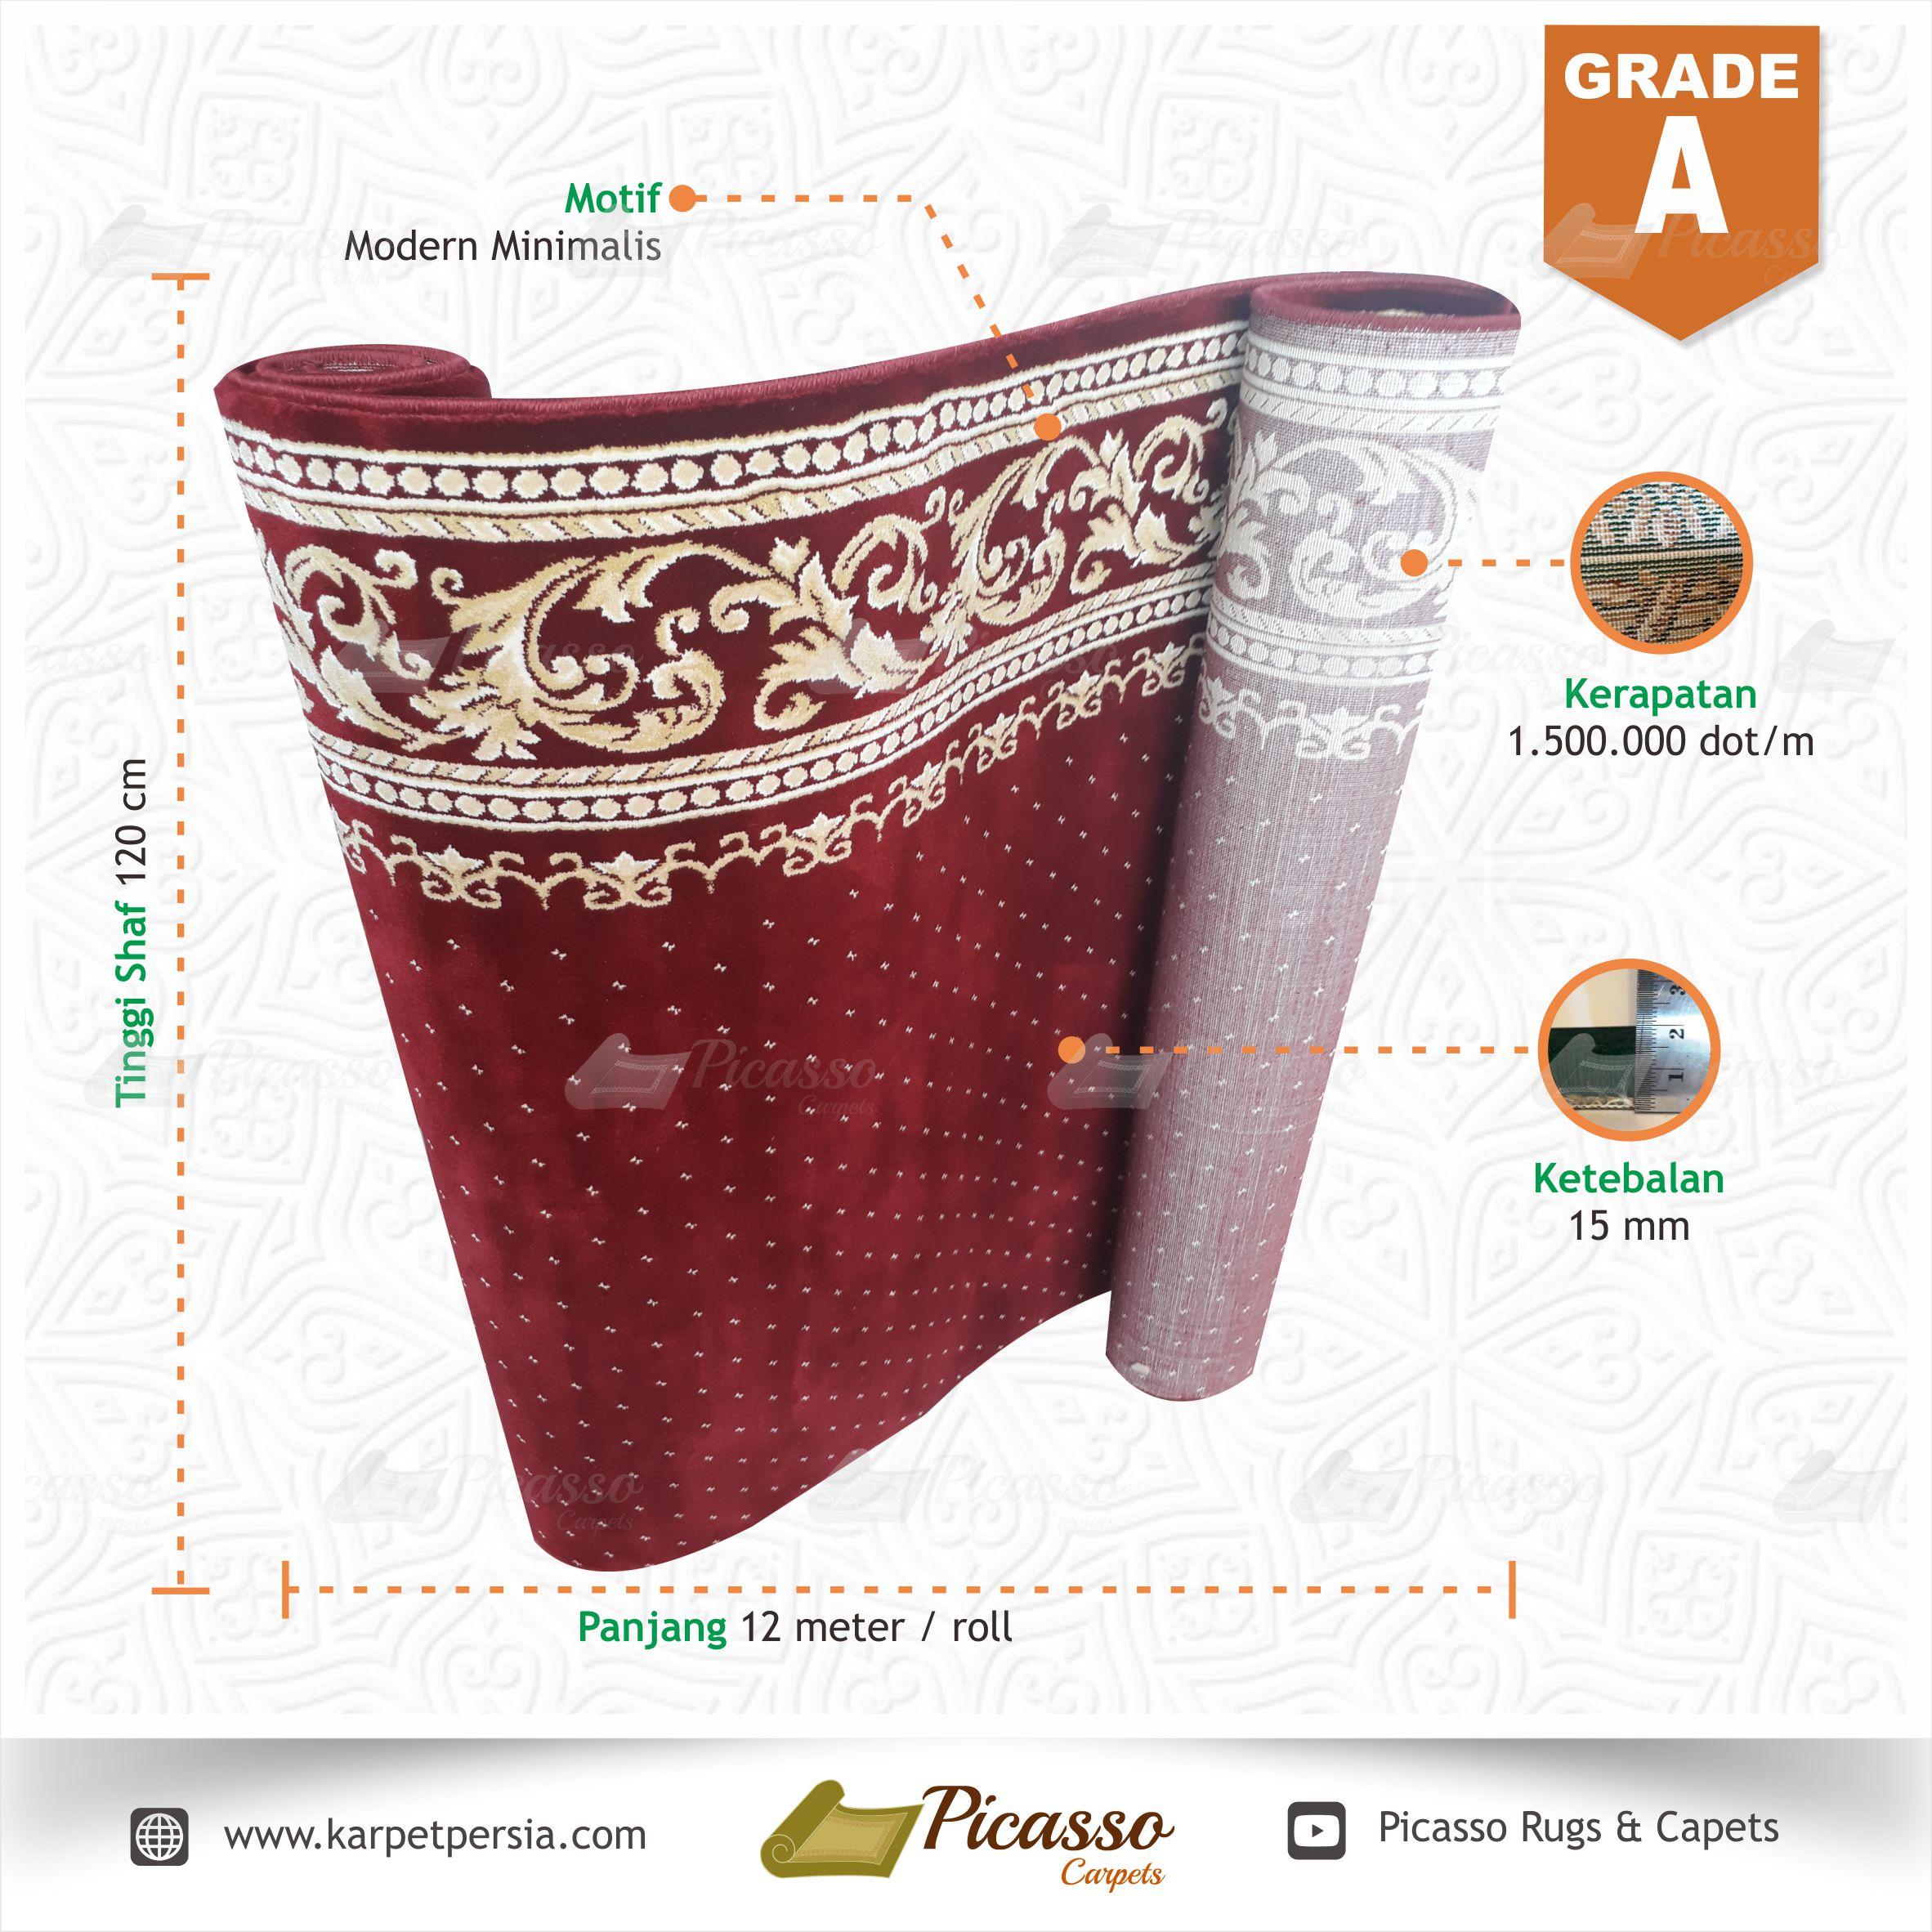 karpet masjid merah grade a8